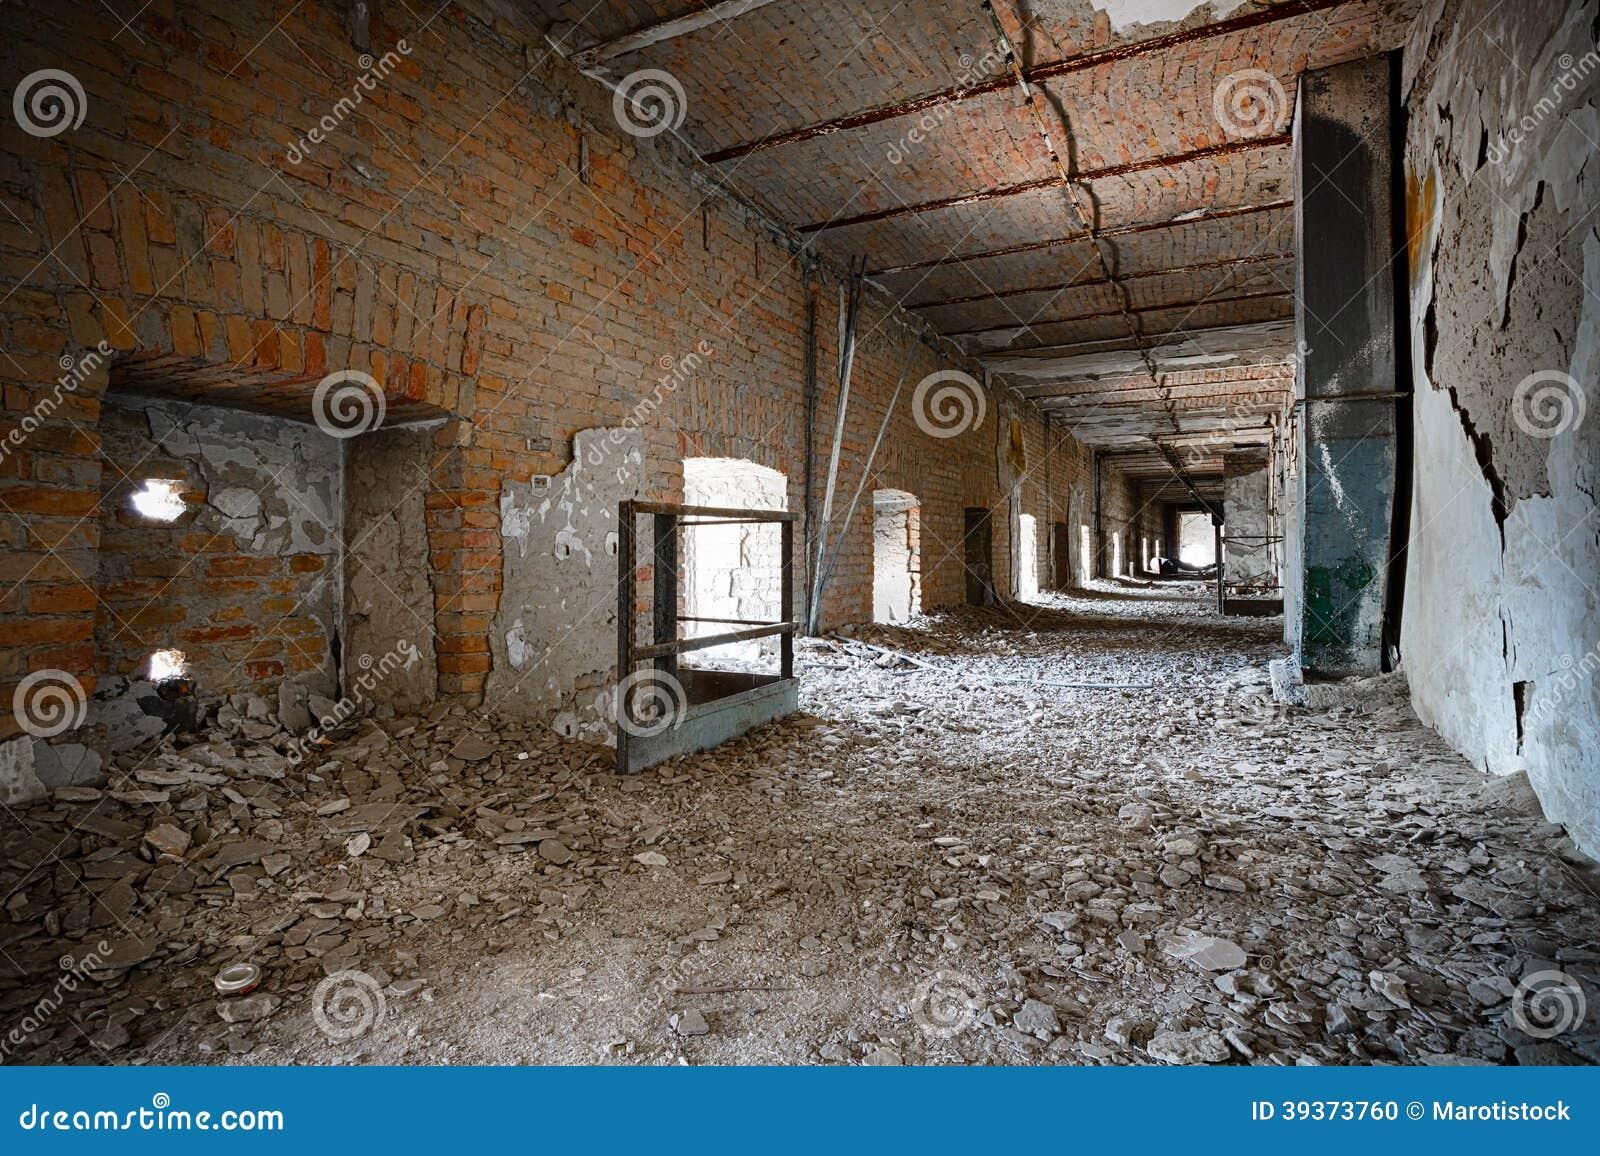 Corridor Roof Design: Old Ruined Industrial Building Corridor, Interior Stock